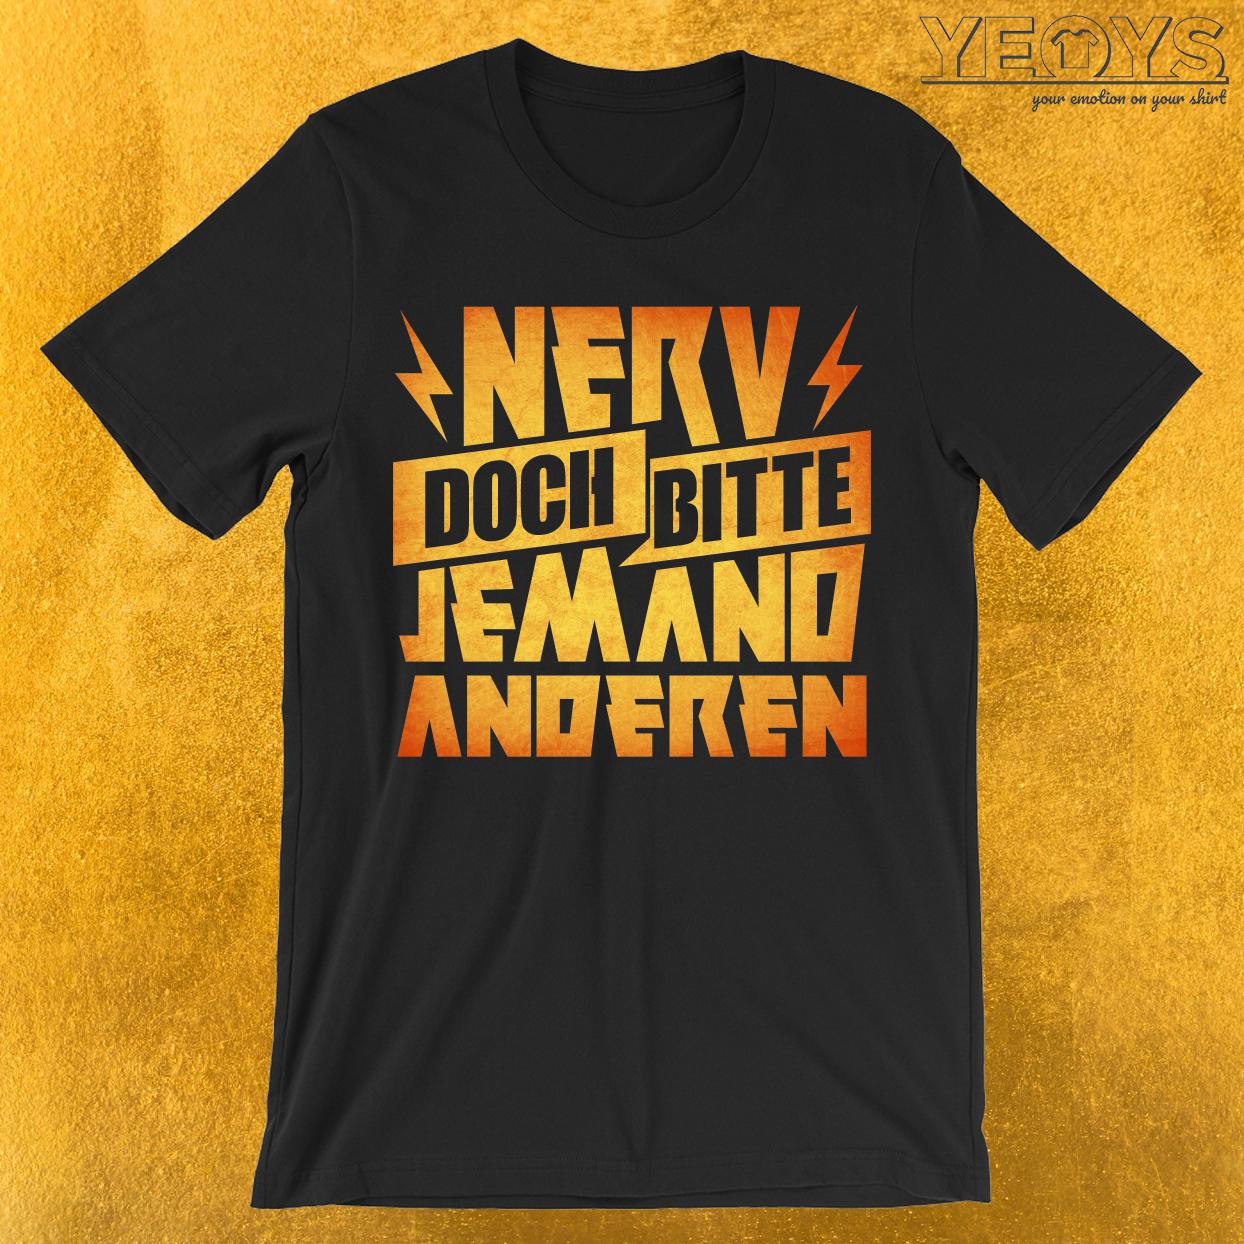 Nerv doch bitte jemand anderen T-Shirt